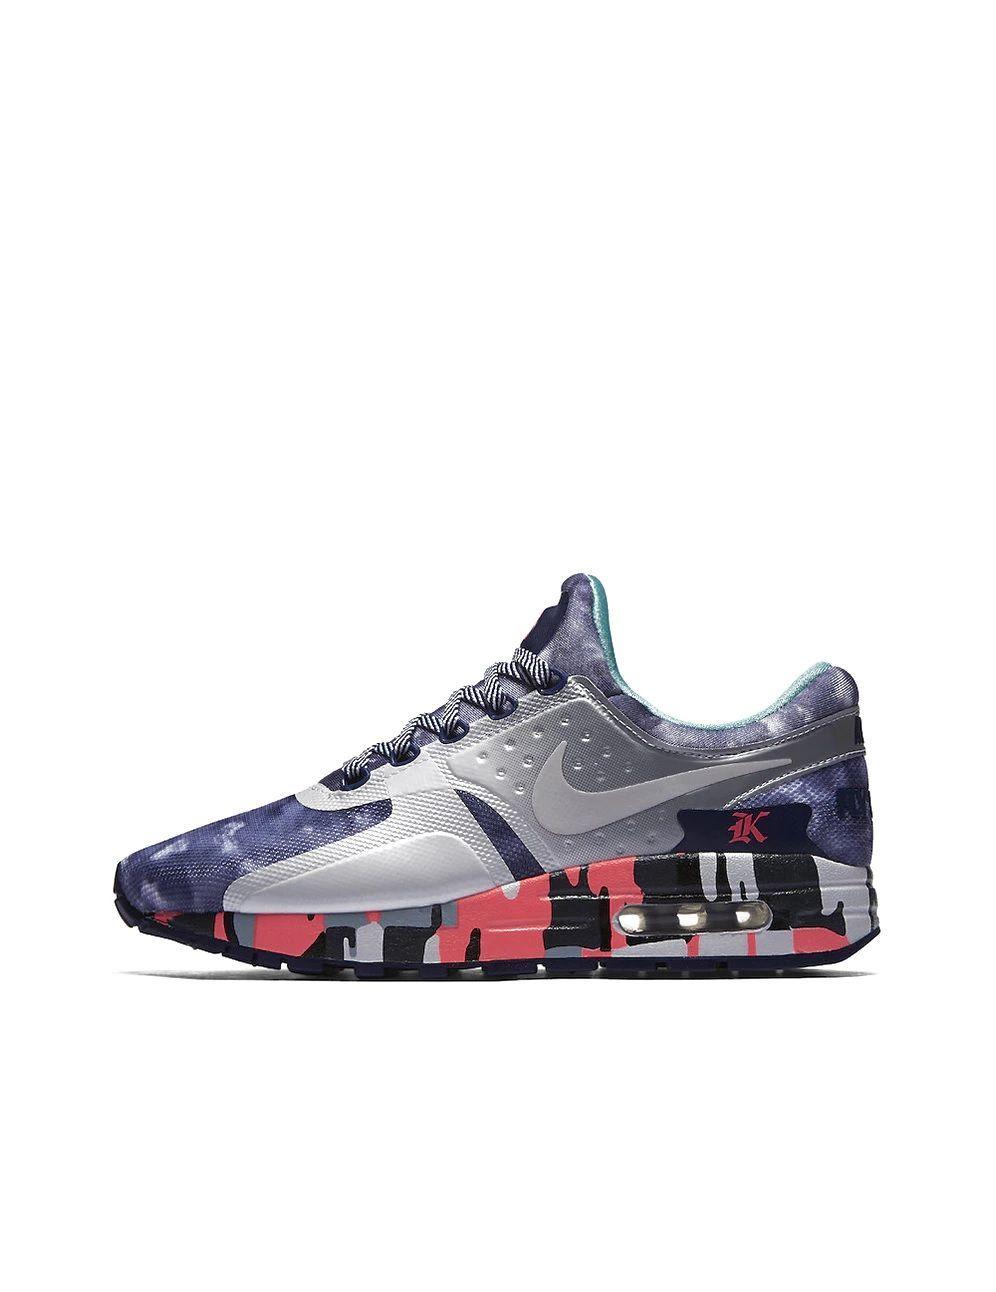 promo code ad6d0 d4451 Wang Junkai x Nike Air Max Zero